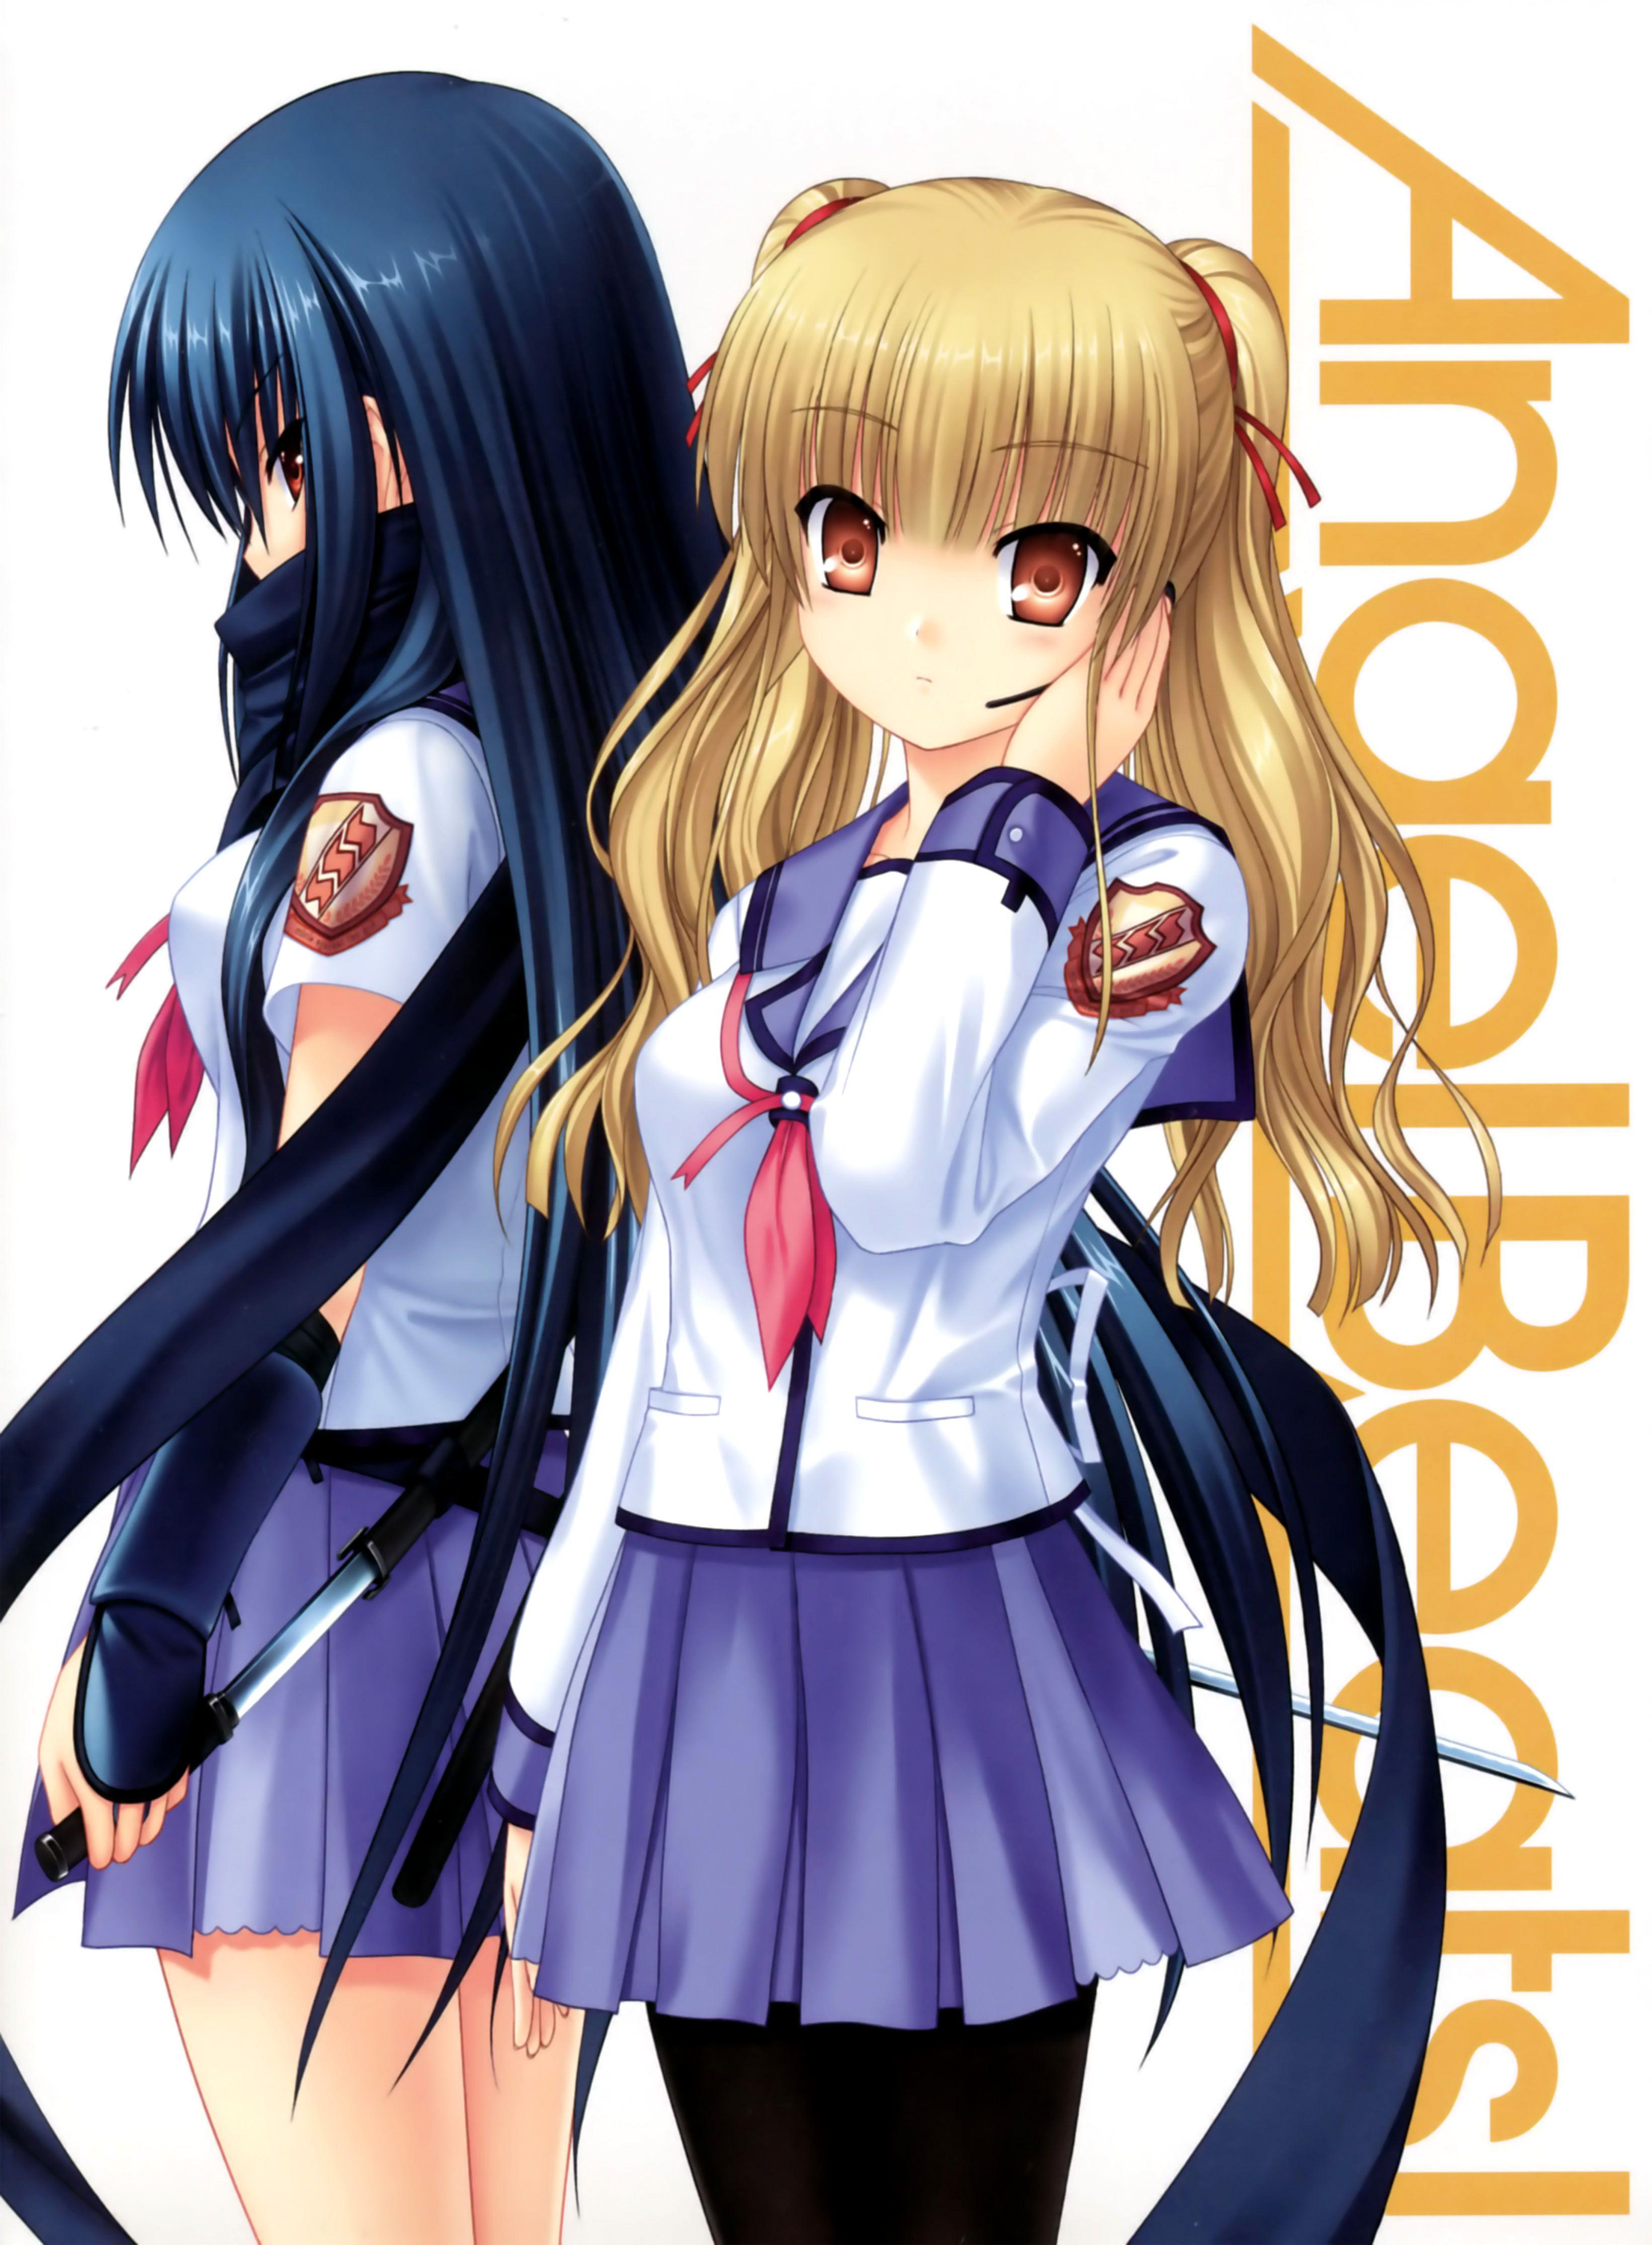 Shiina and Yusa imagens) Anime, Imagem de anime, Doki